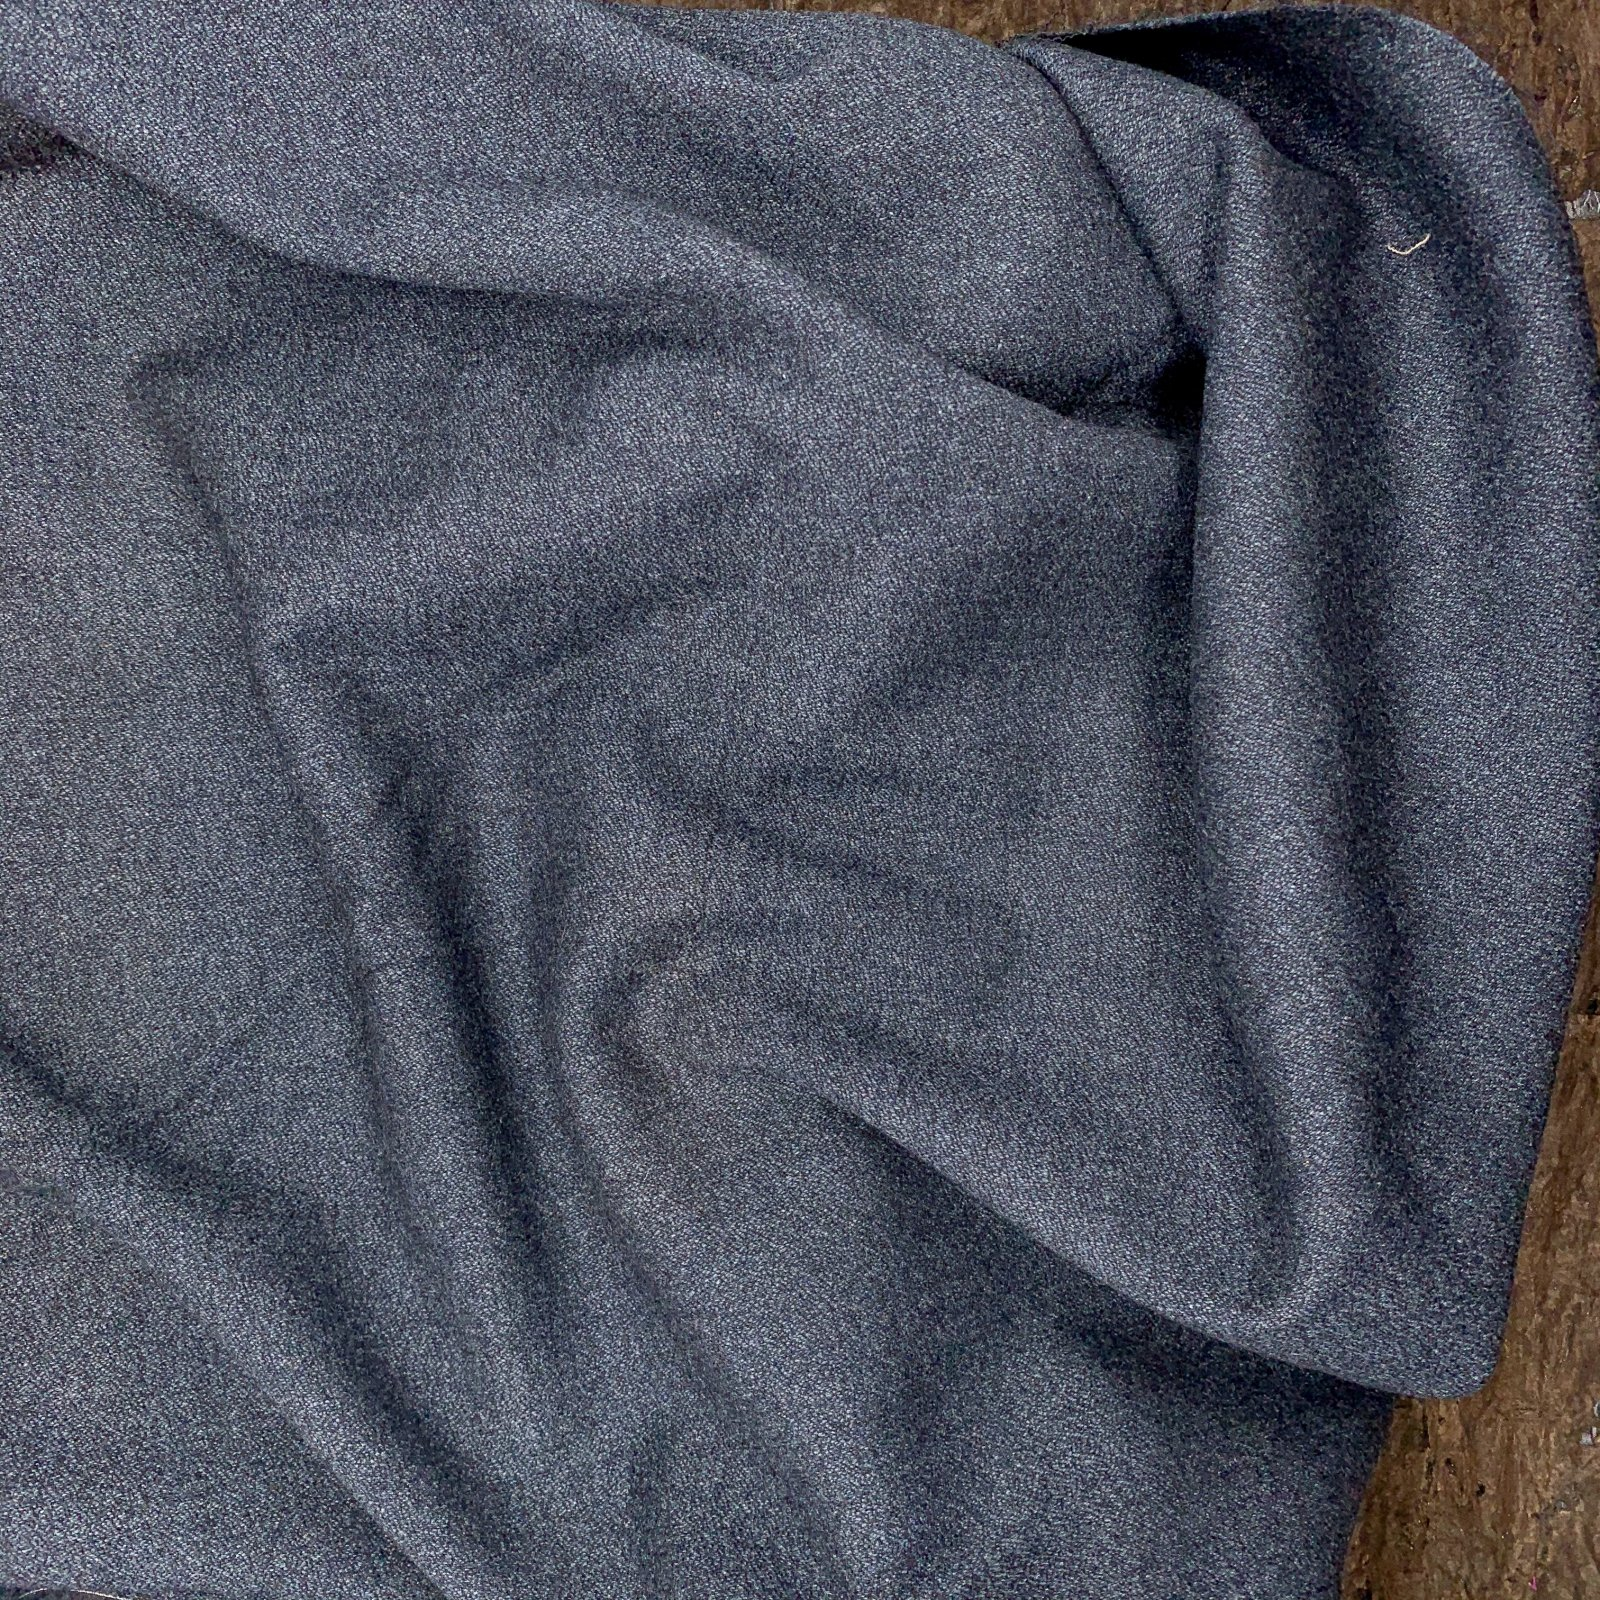 Heathered Navy  - Italian Wool